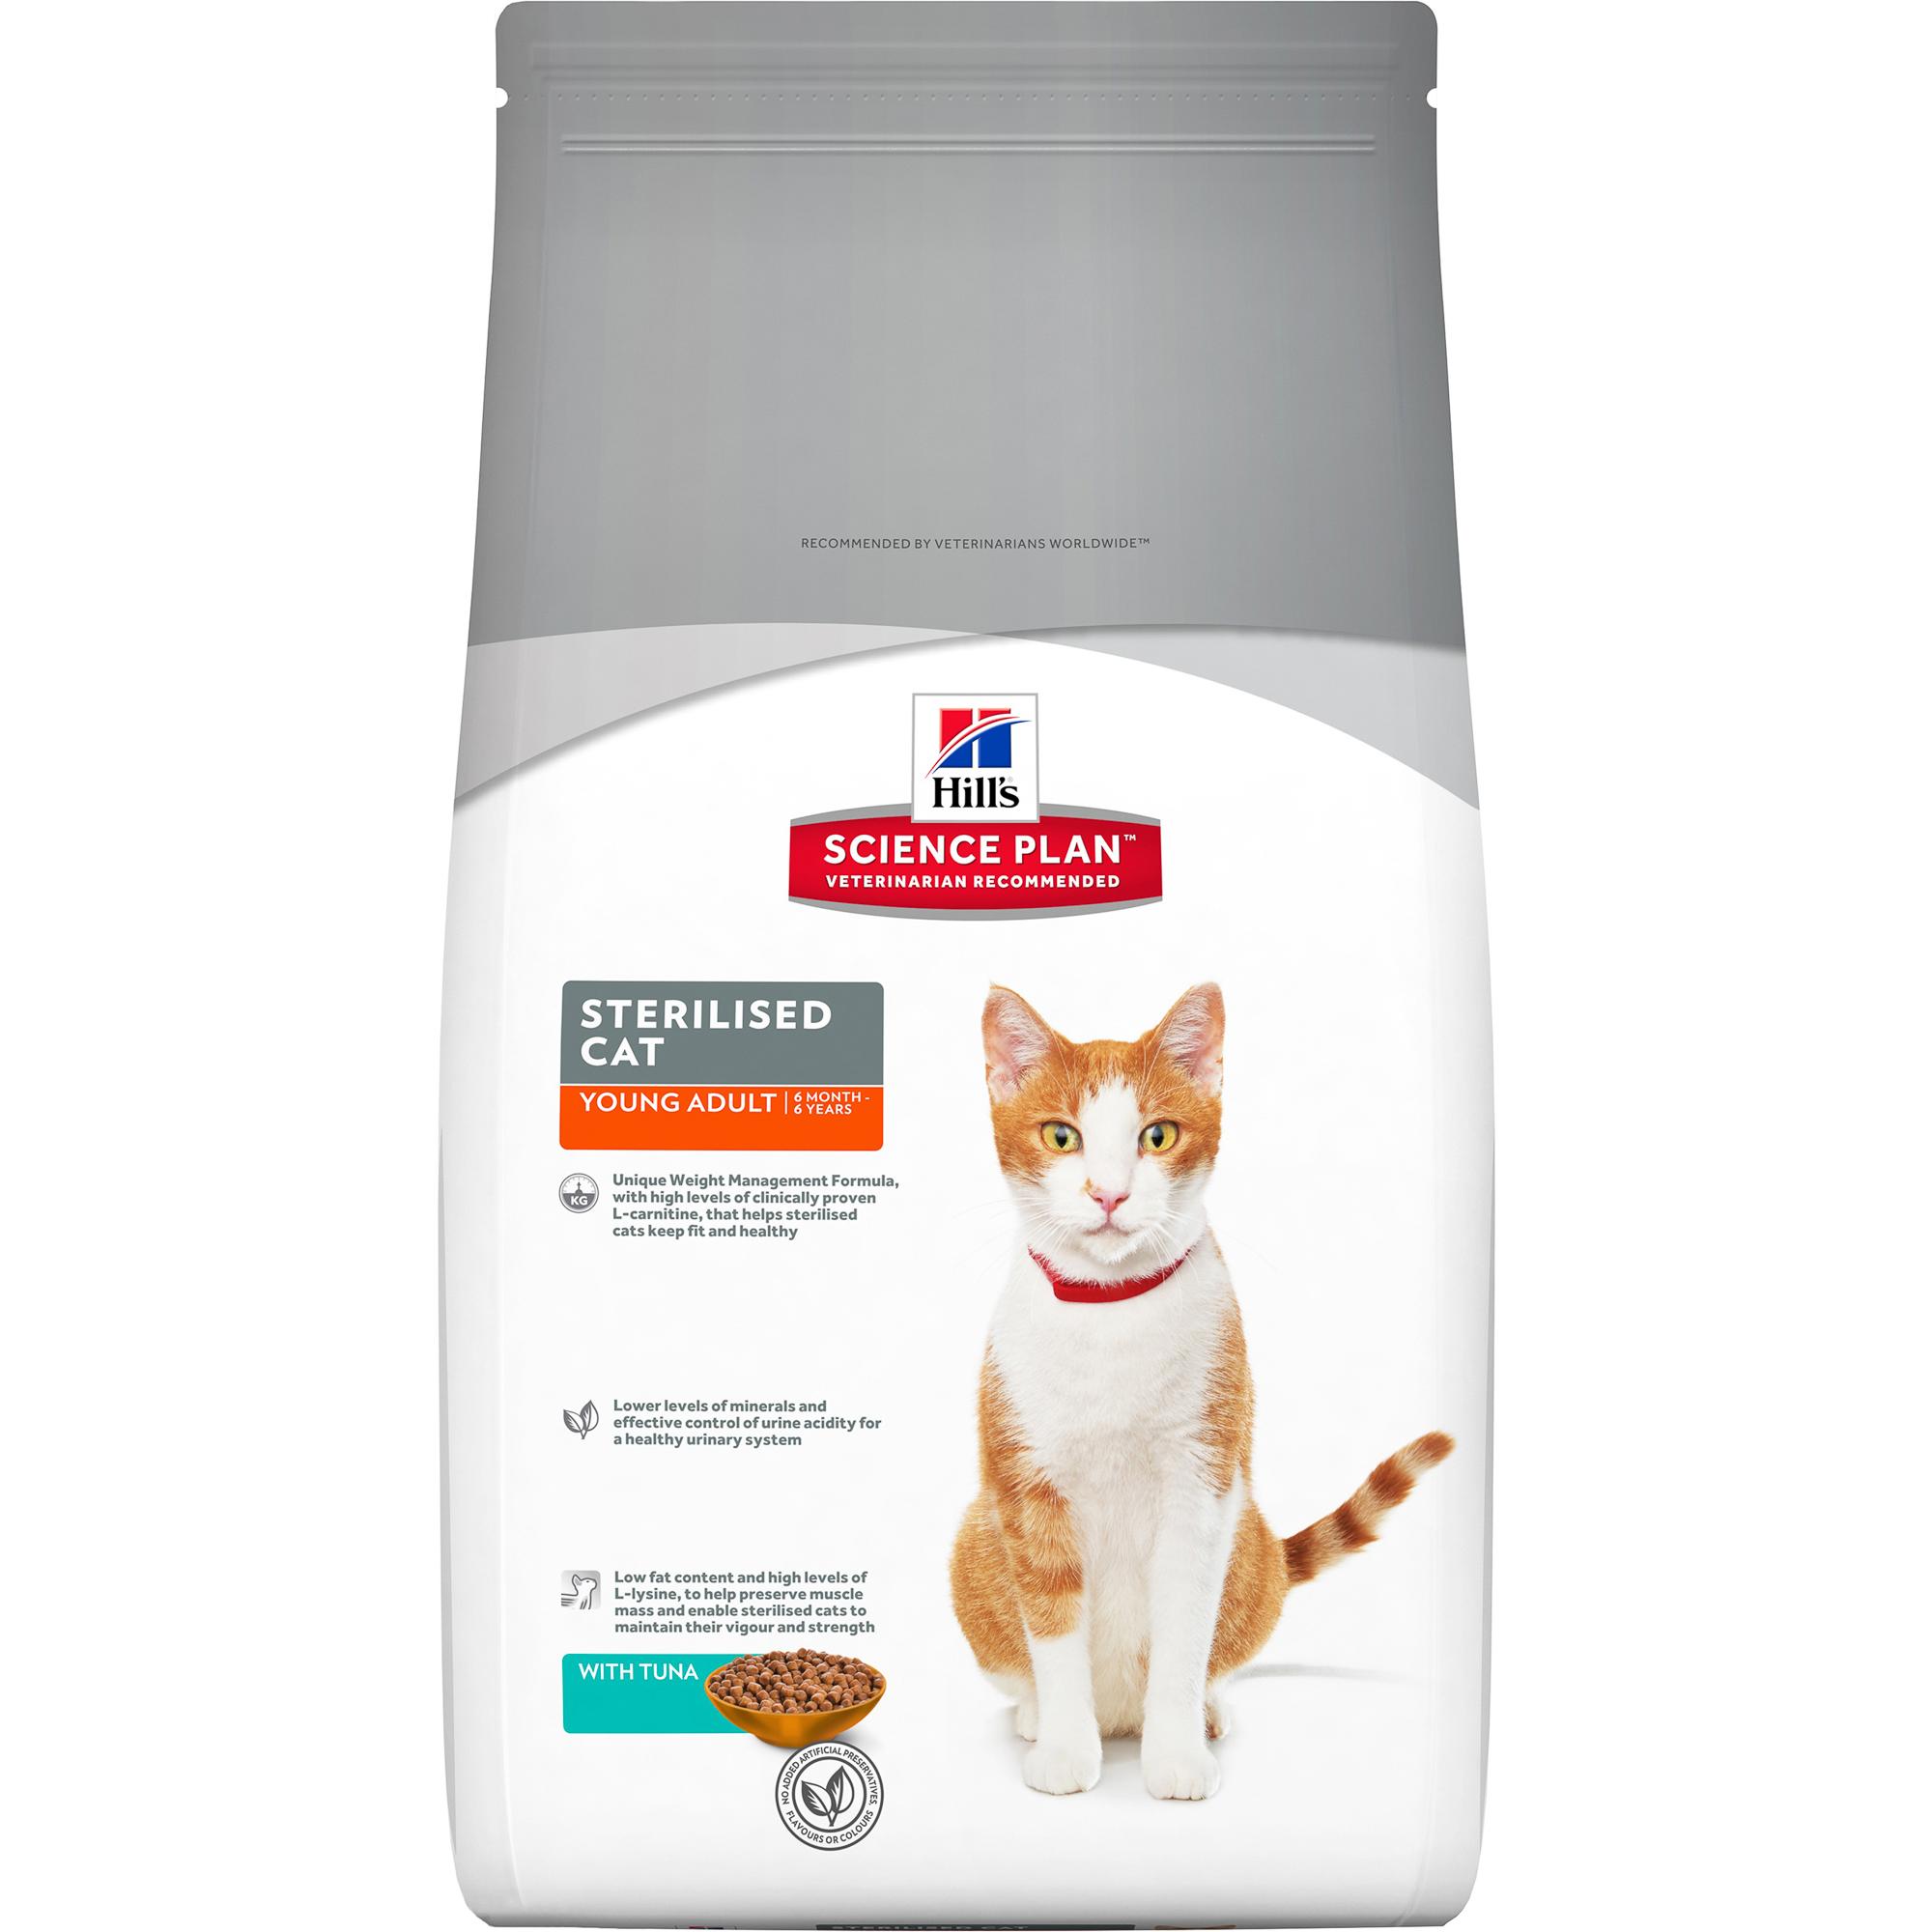 Корм для кошек Hill's Science Plan Feline Sterilised Cat Young Adult с тунцом 300г.